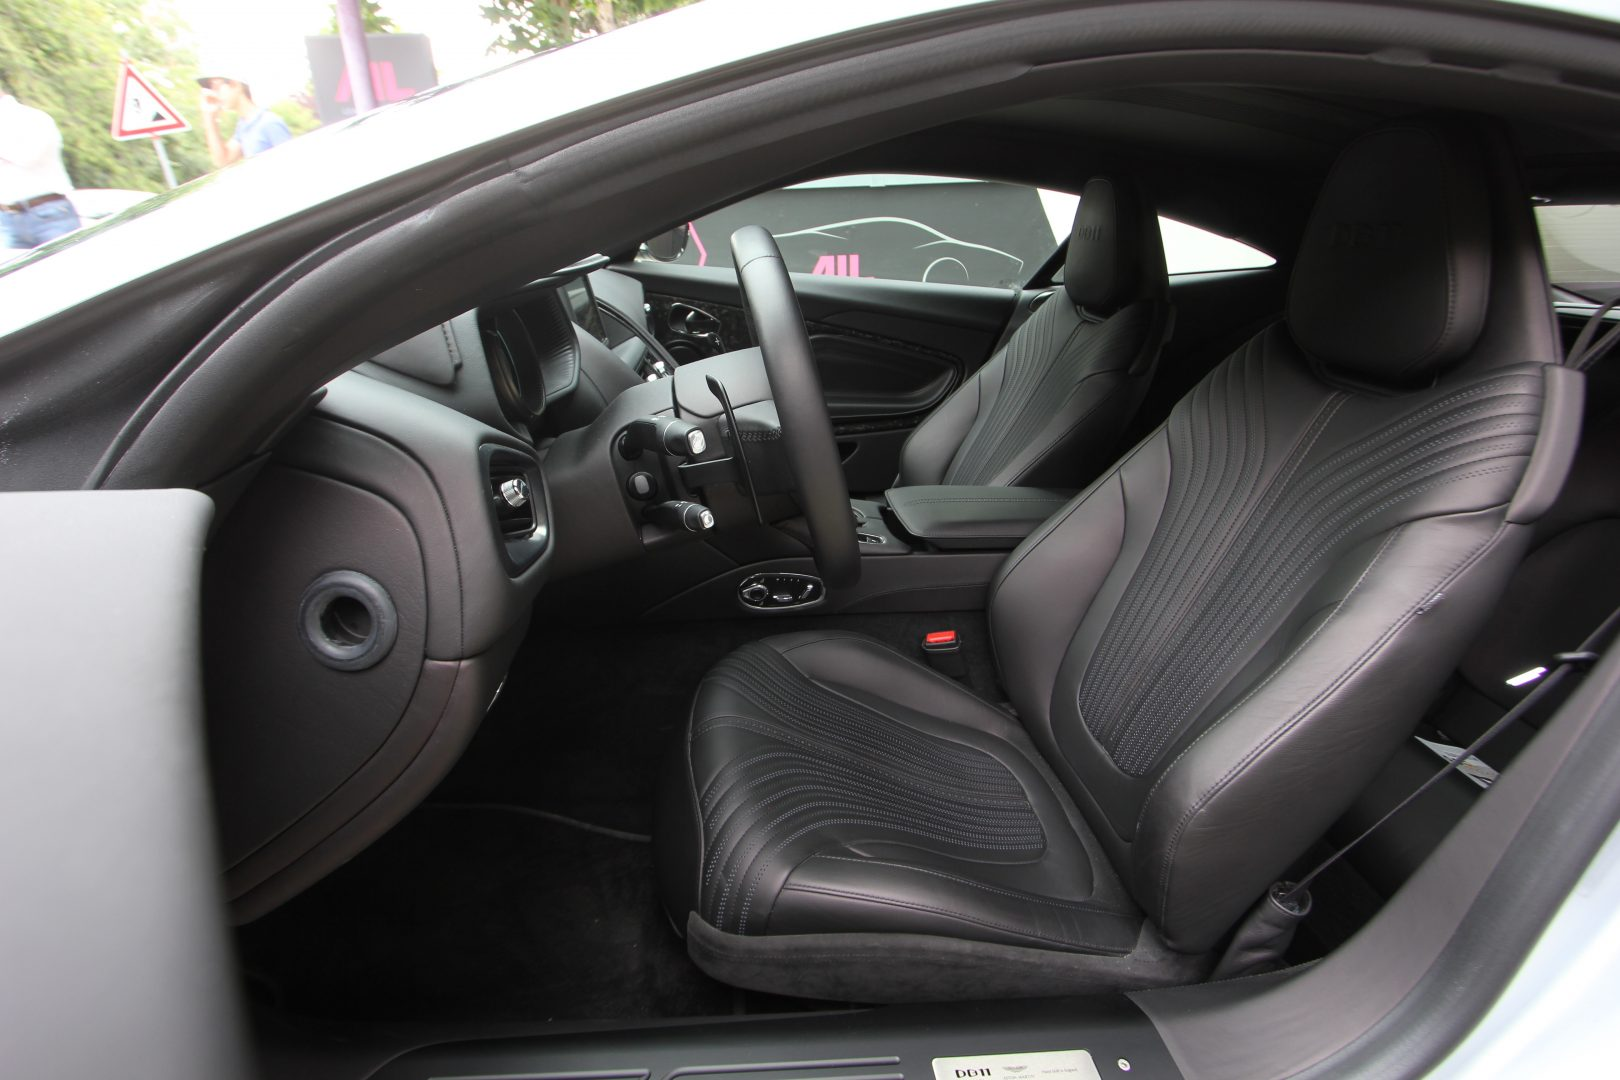 AIL Aston Martin DB11 Coupe 5.2 V12 11